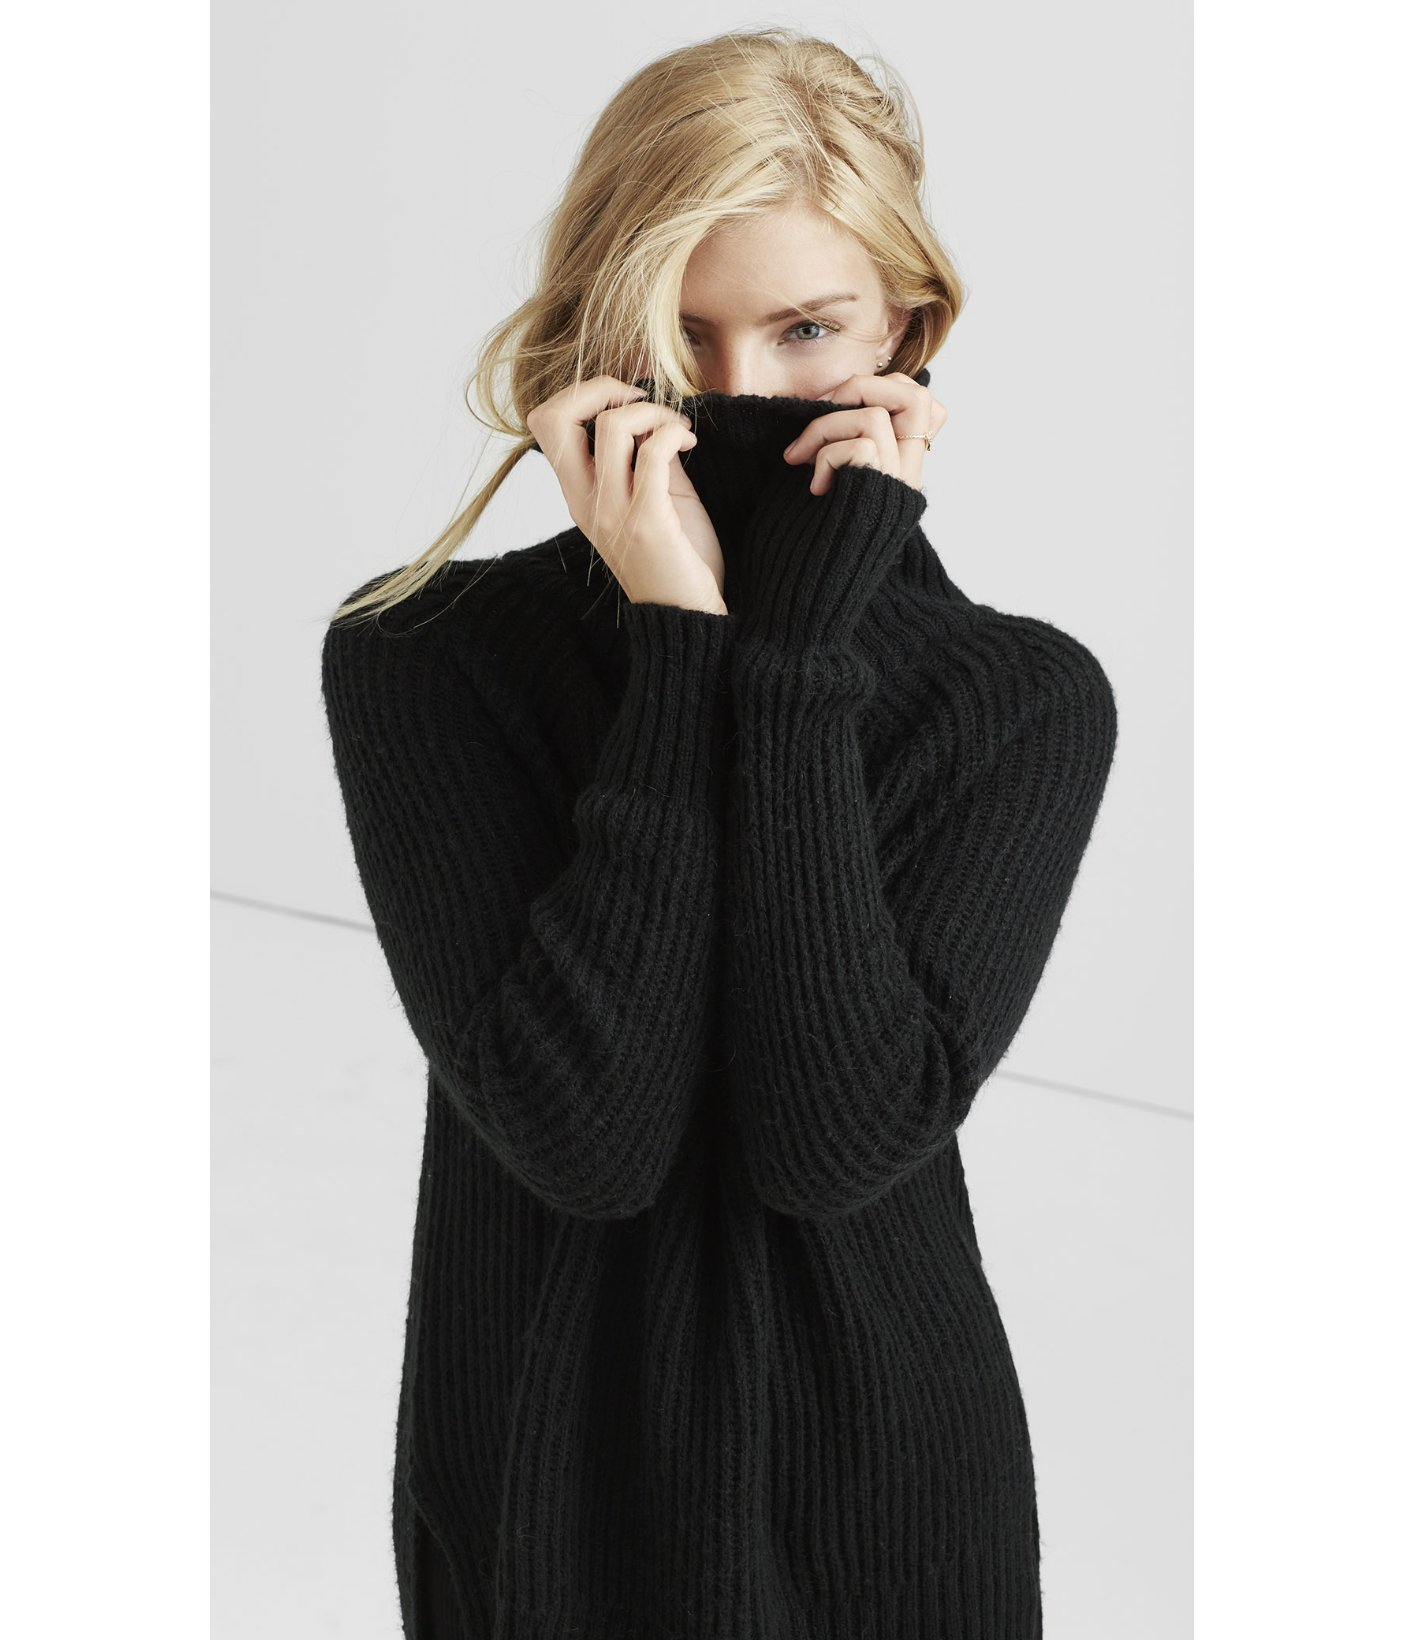 Express Boxy Extreme Hi-lo Hem Turtleneck Sweater in Black | Lyst